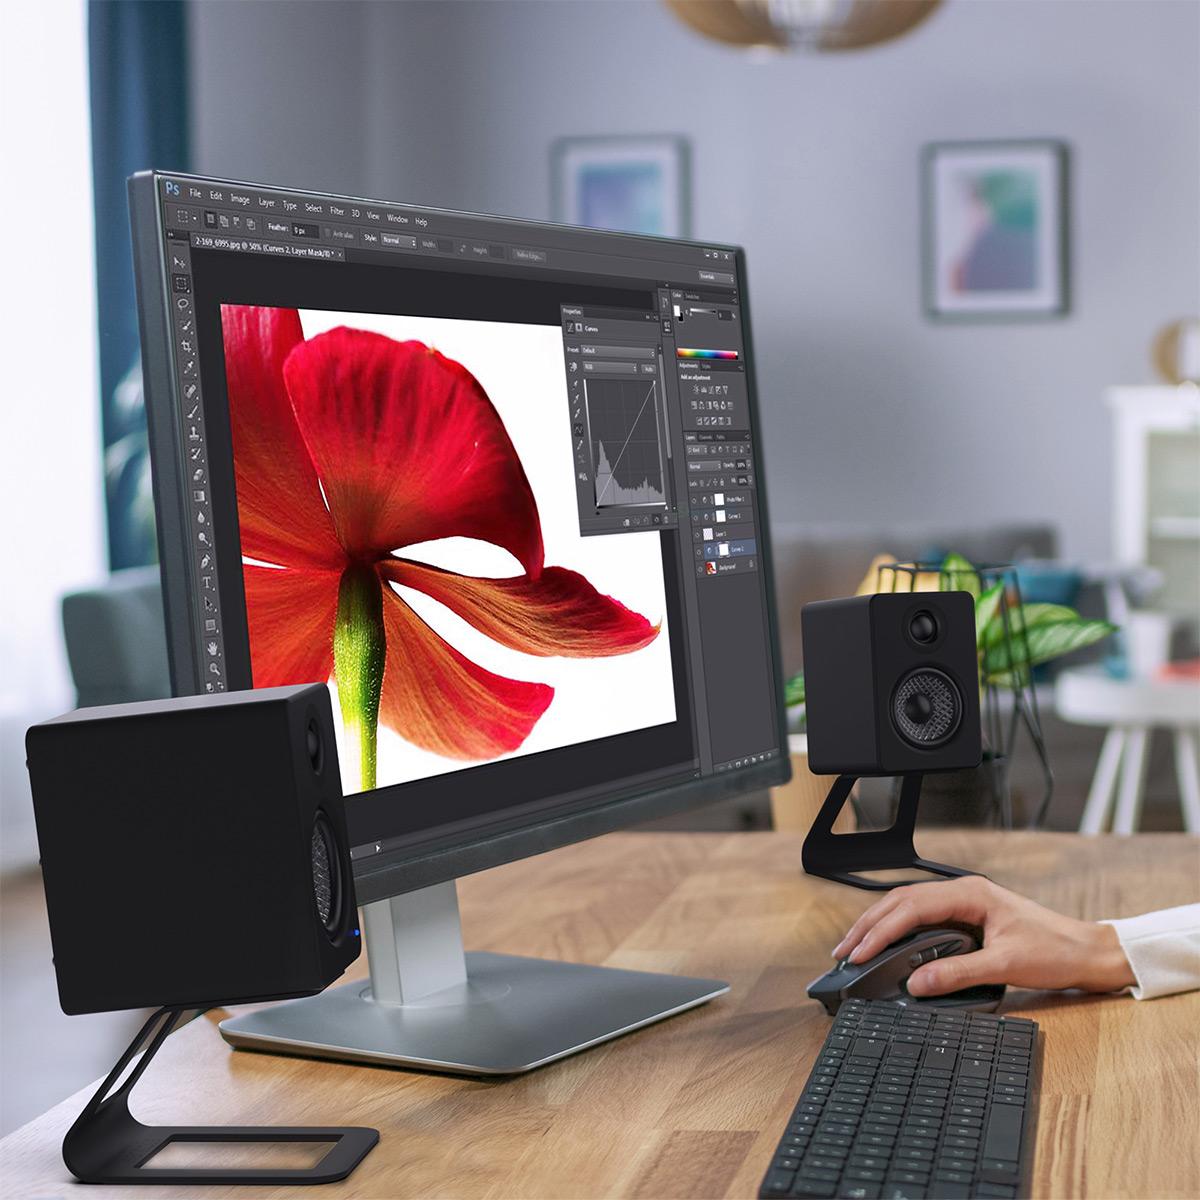 thumbnail 9 - Kanto YU2 Powered Desktop Speakers - Pair